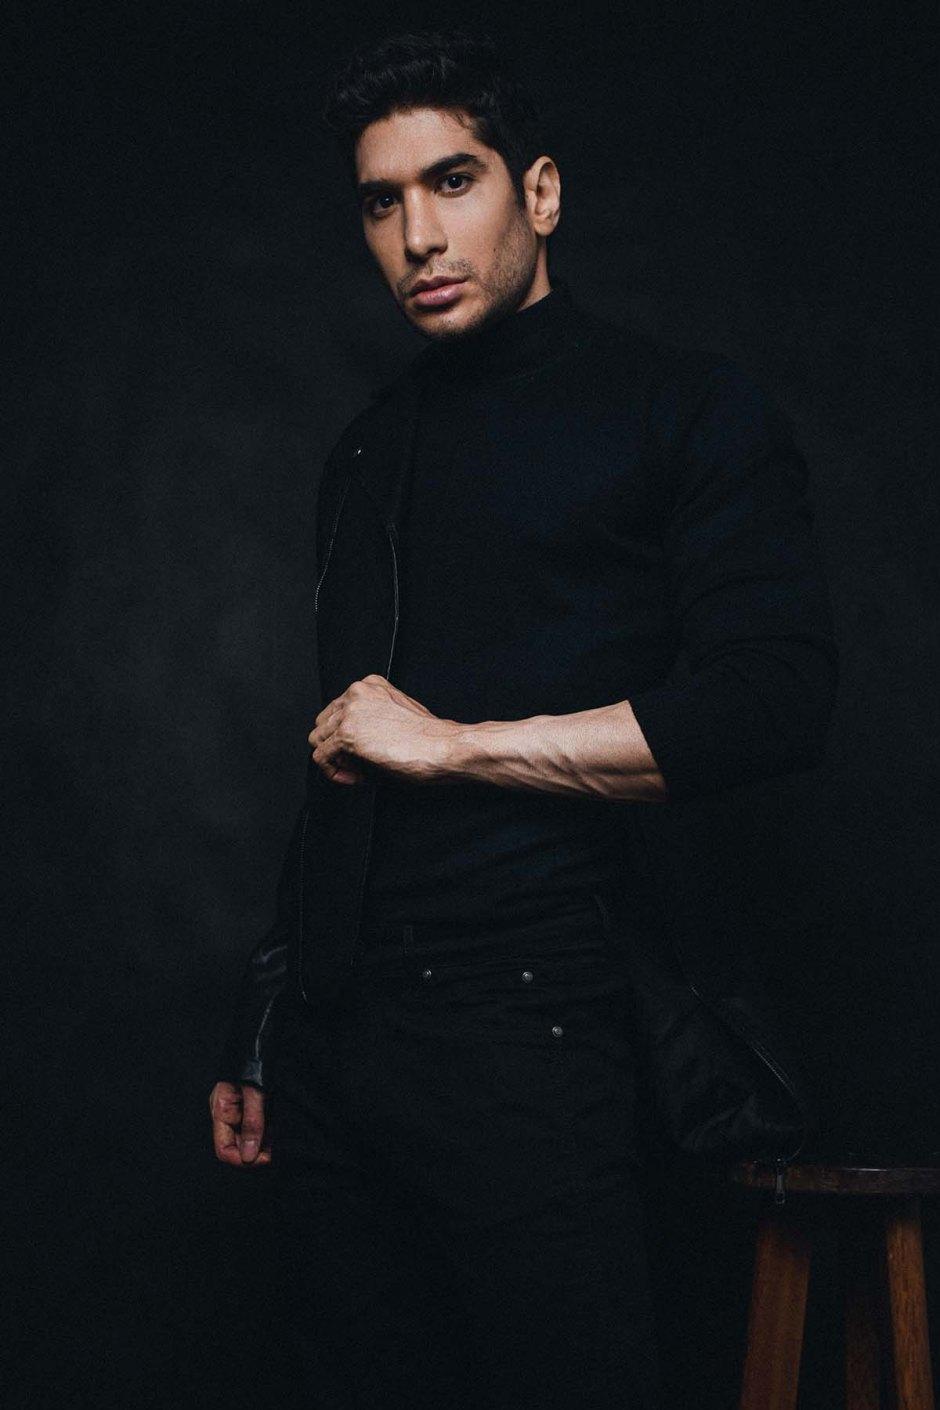 Felipe Abud by Olavo Martins for Brazilian Male Model_0003